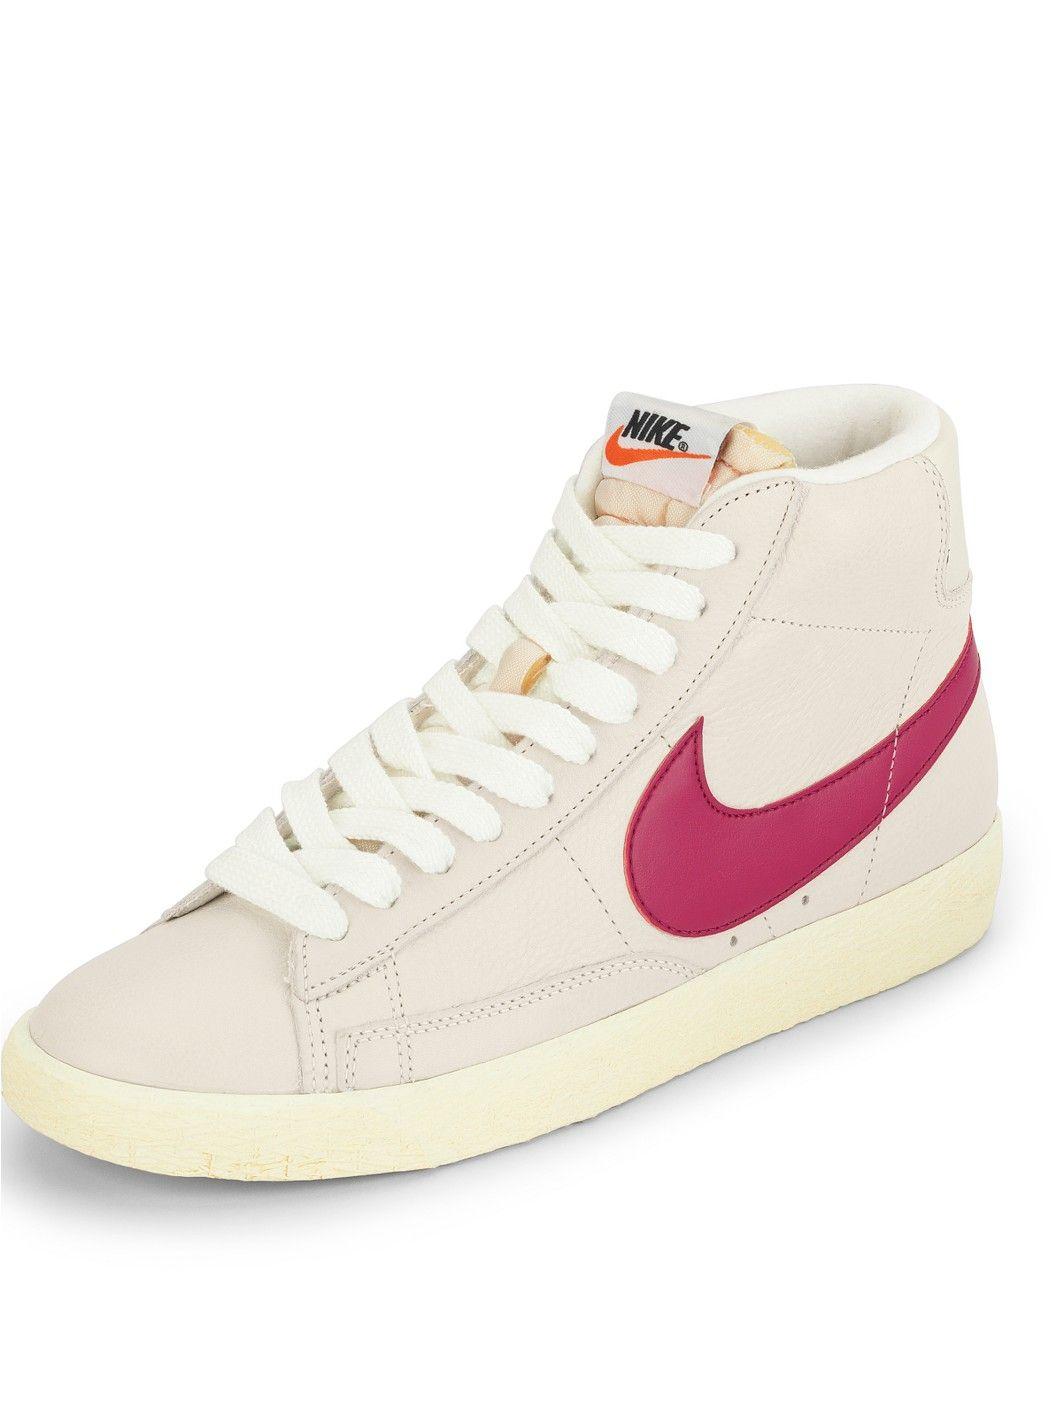 sale retailer 369b7 40587 Nike Blazer Mid Leather Vintage Hi-Tops